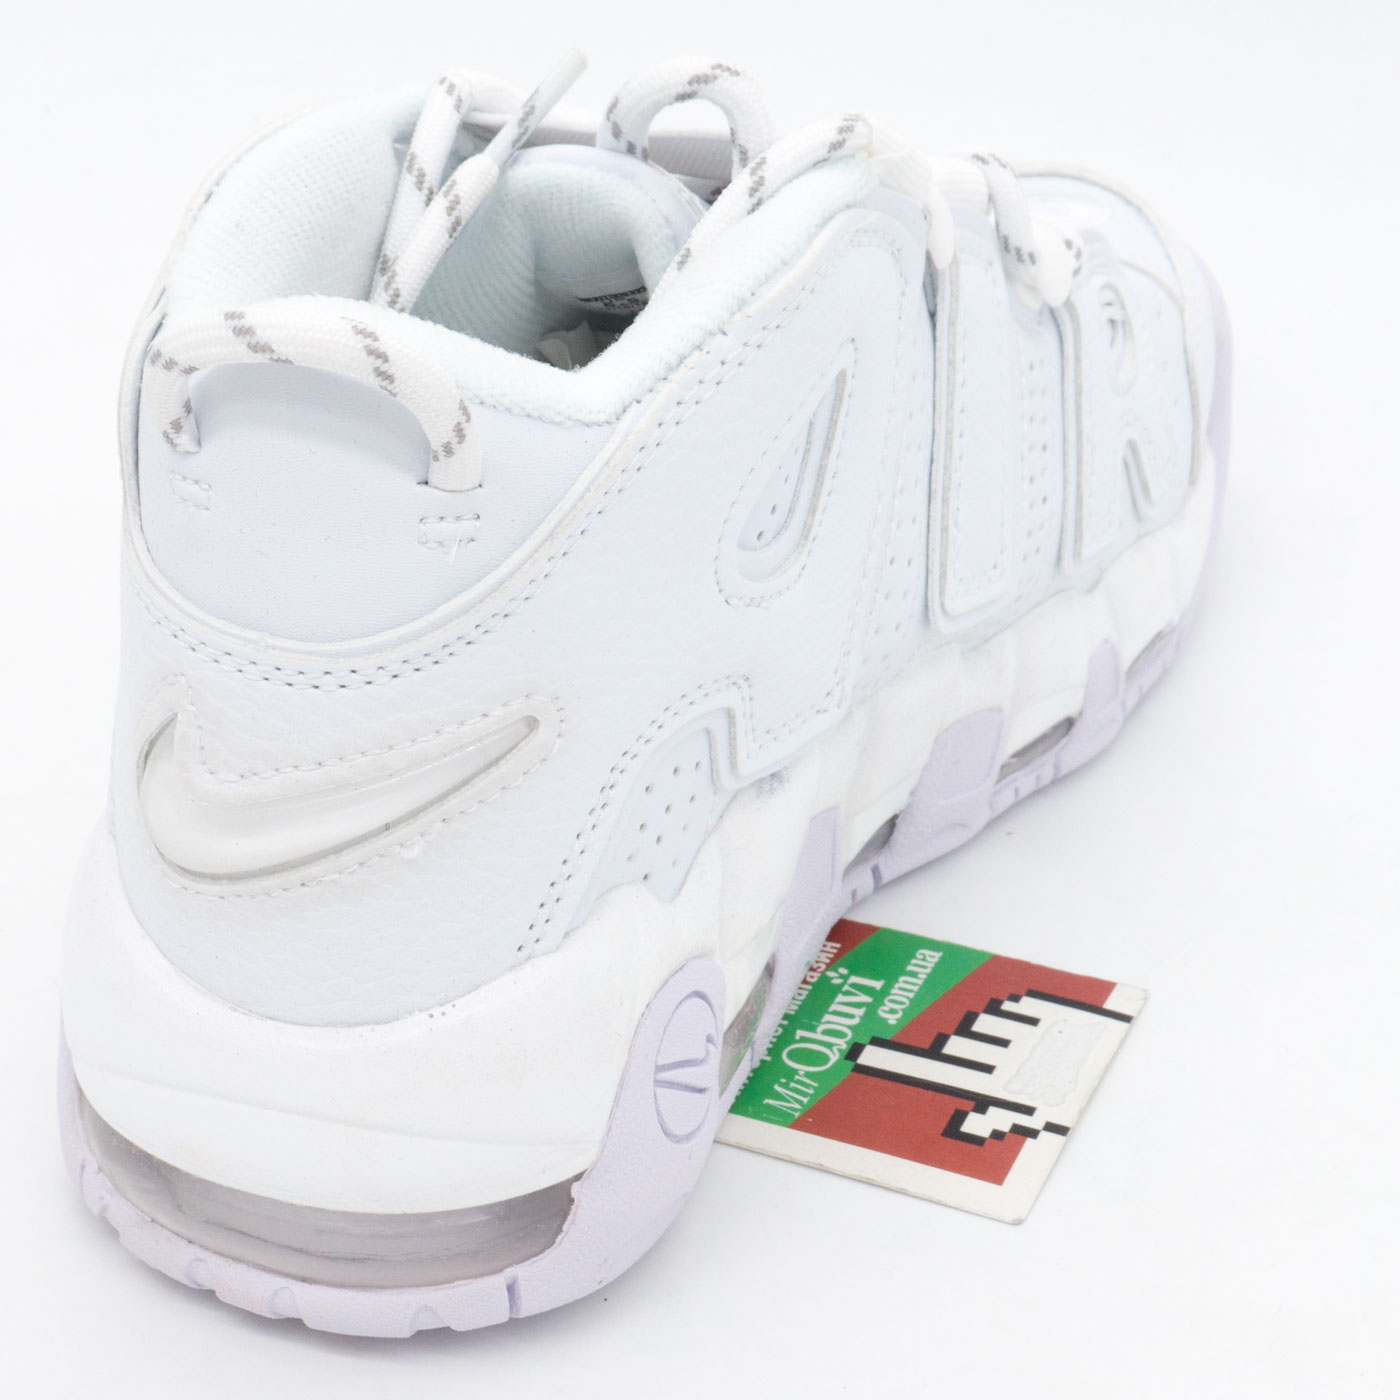 фото back Кроссовки Nike Air More Uptempo белые. Топ качество! back